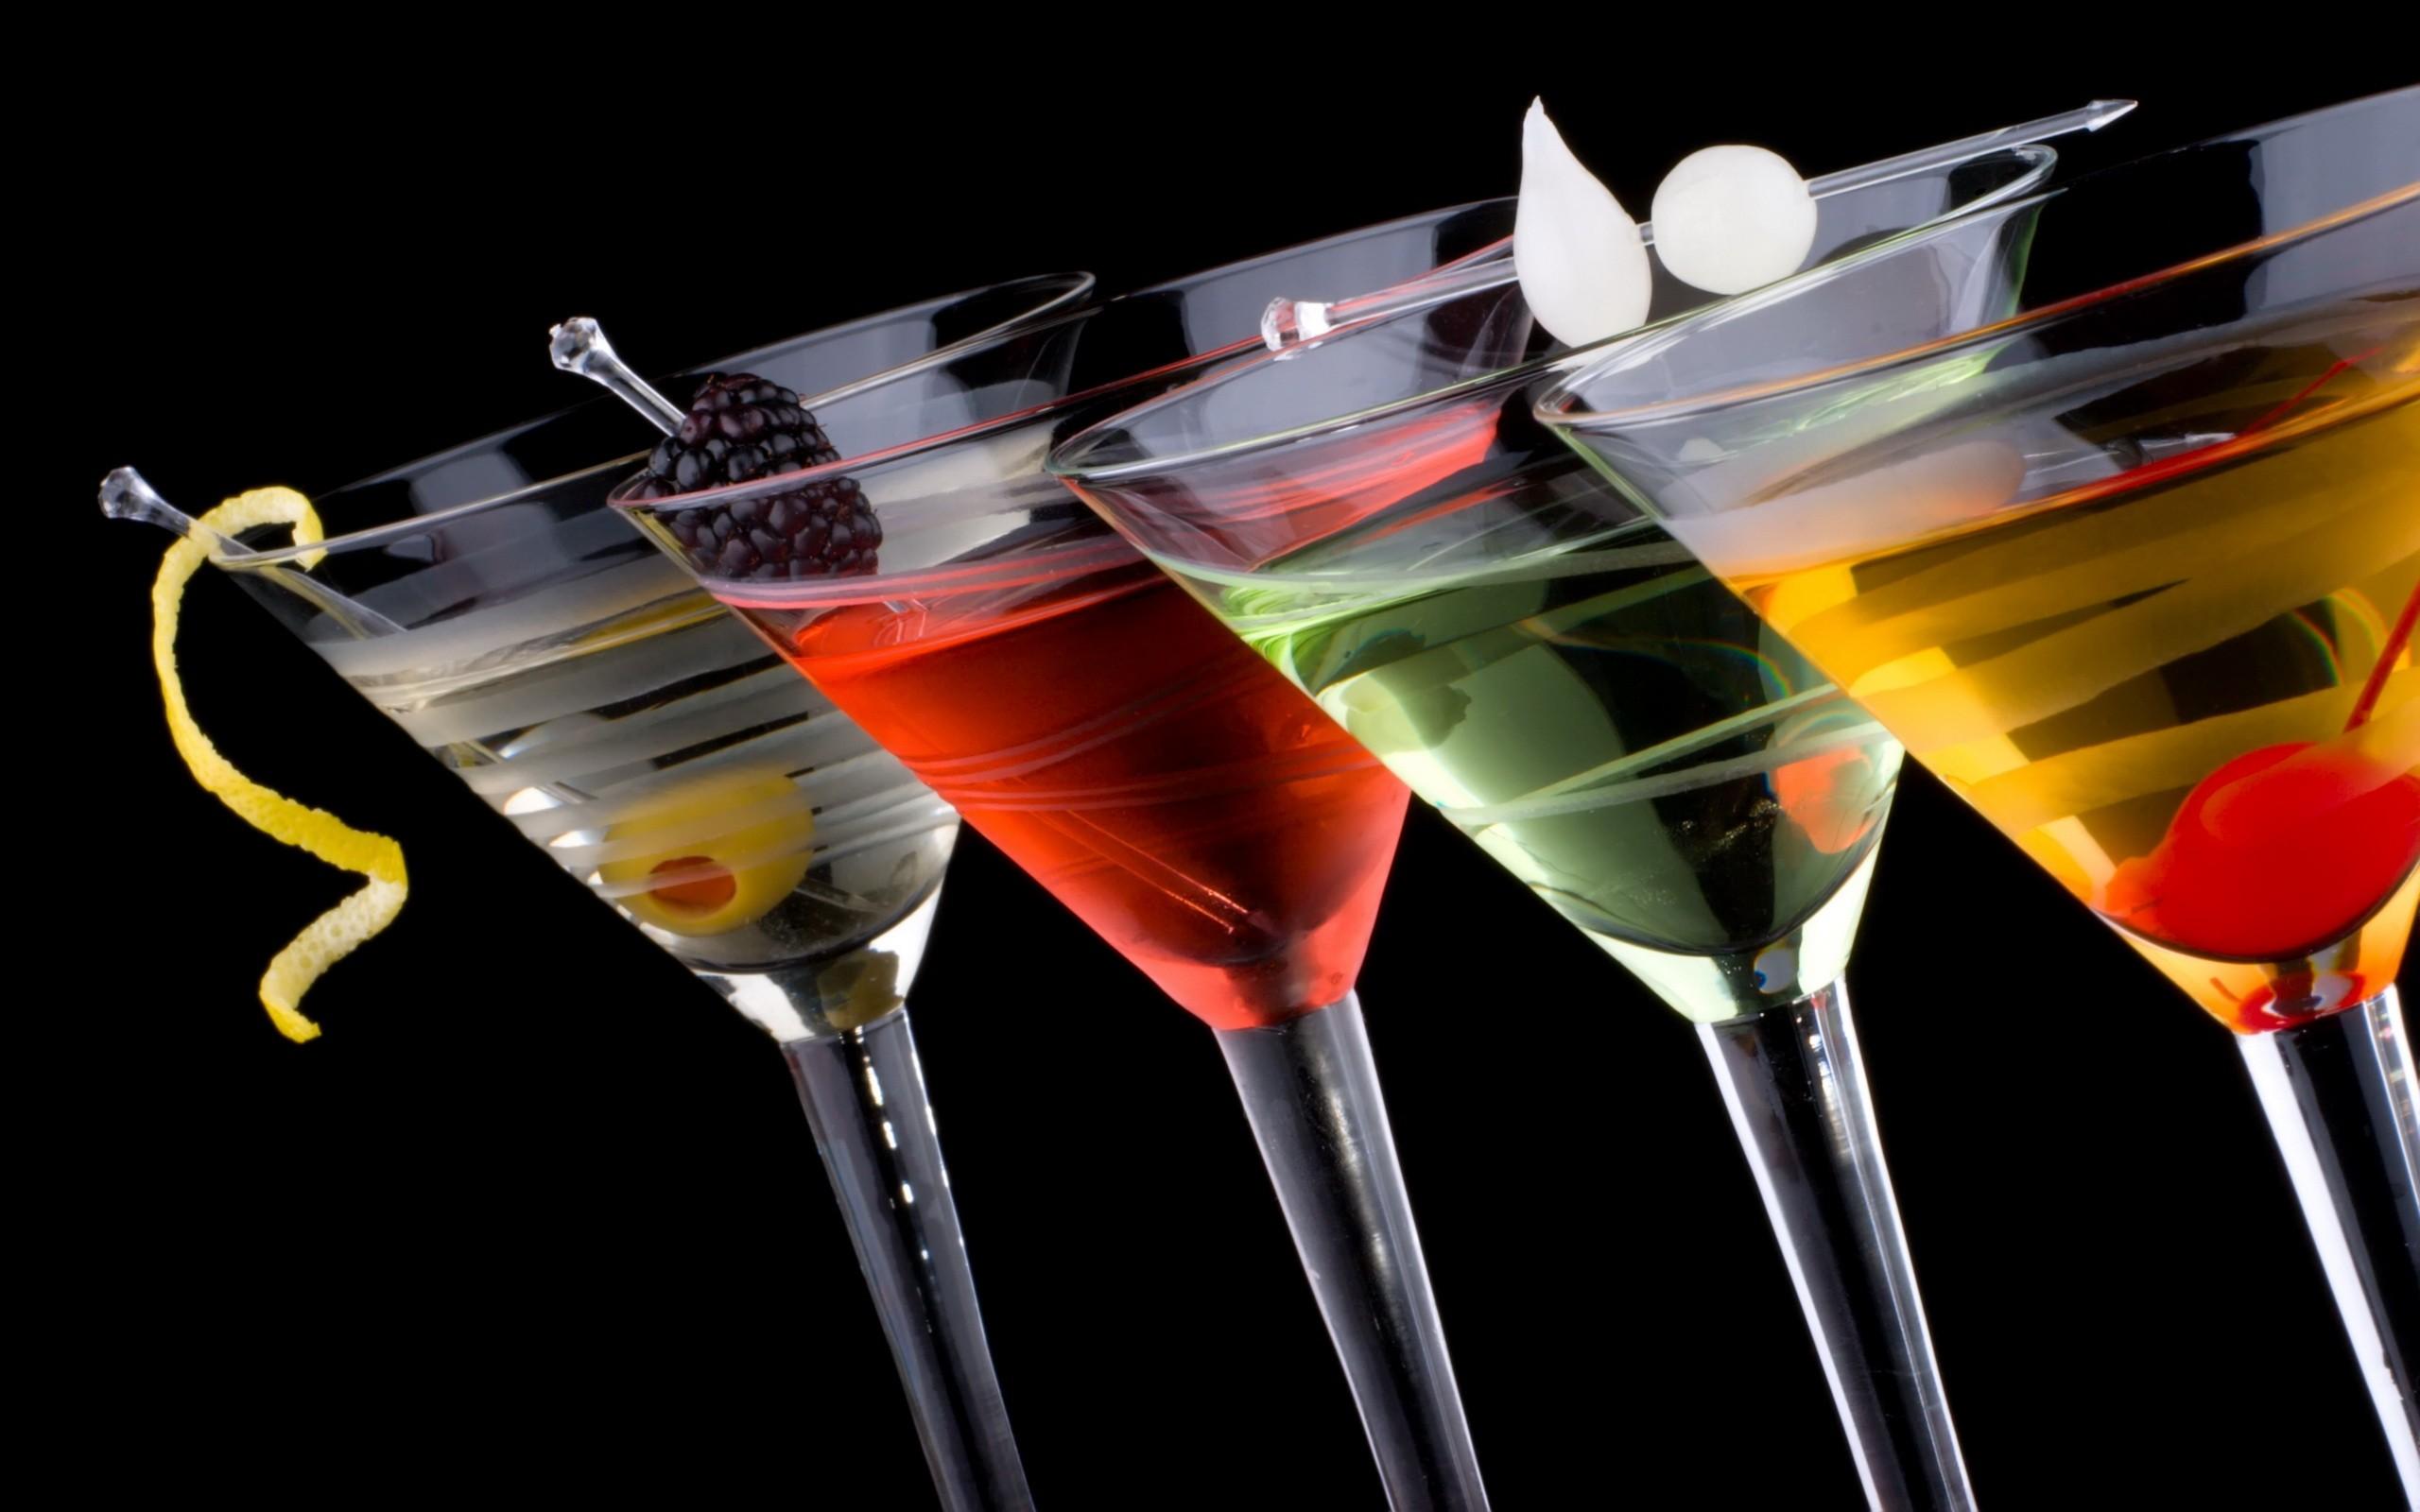 Quale cocktail sei